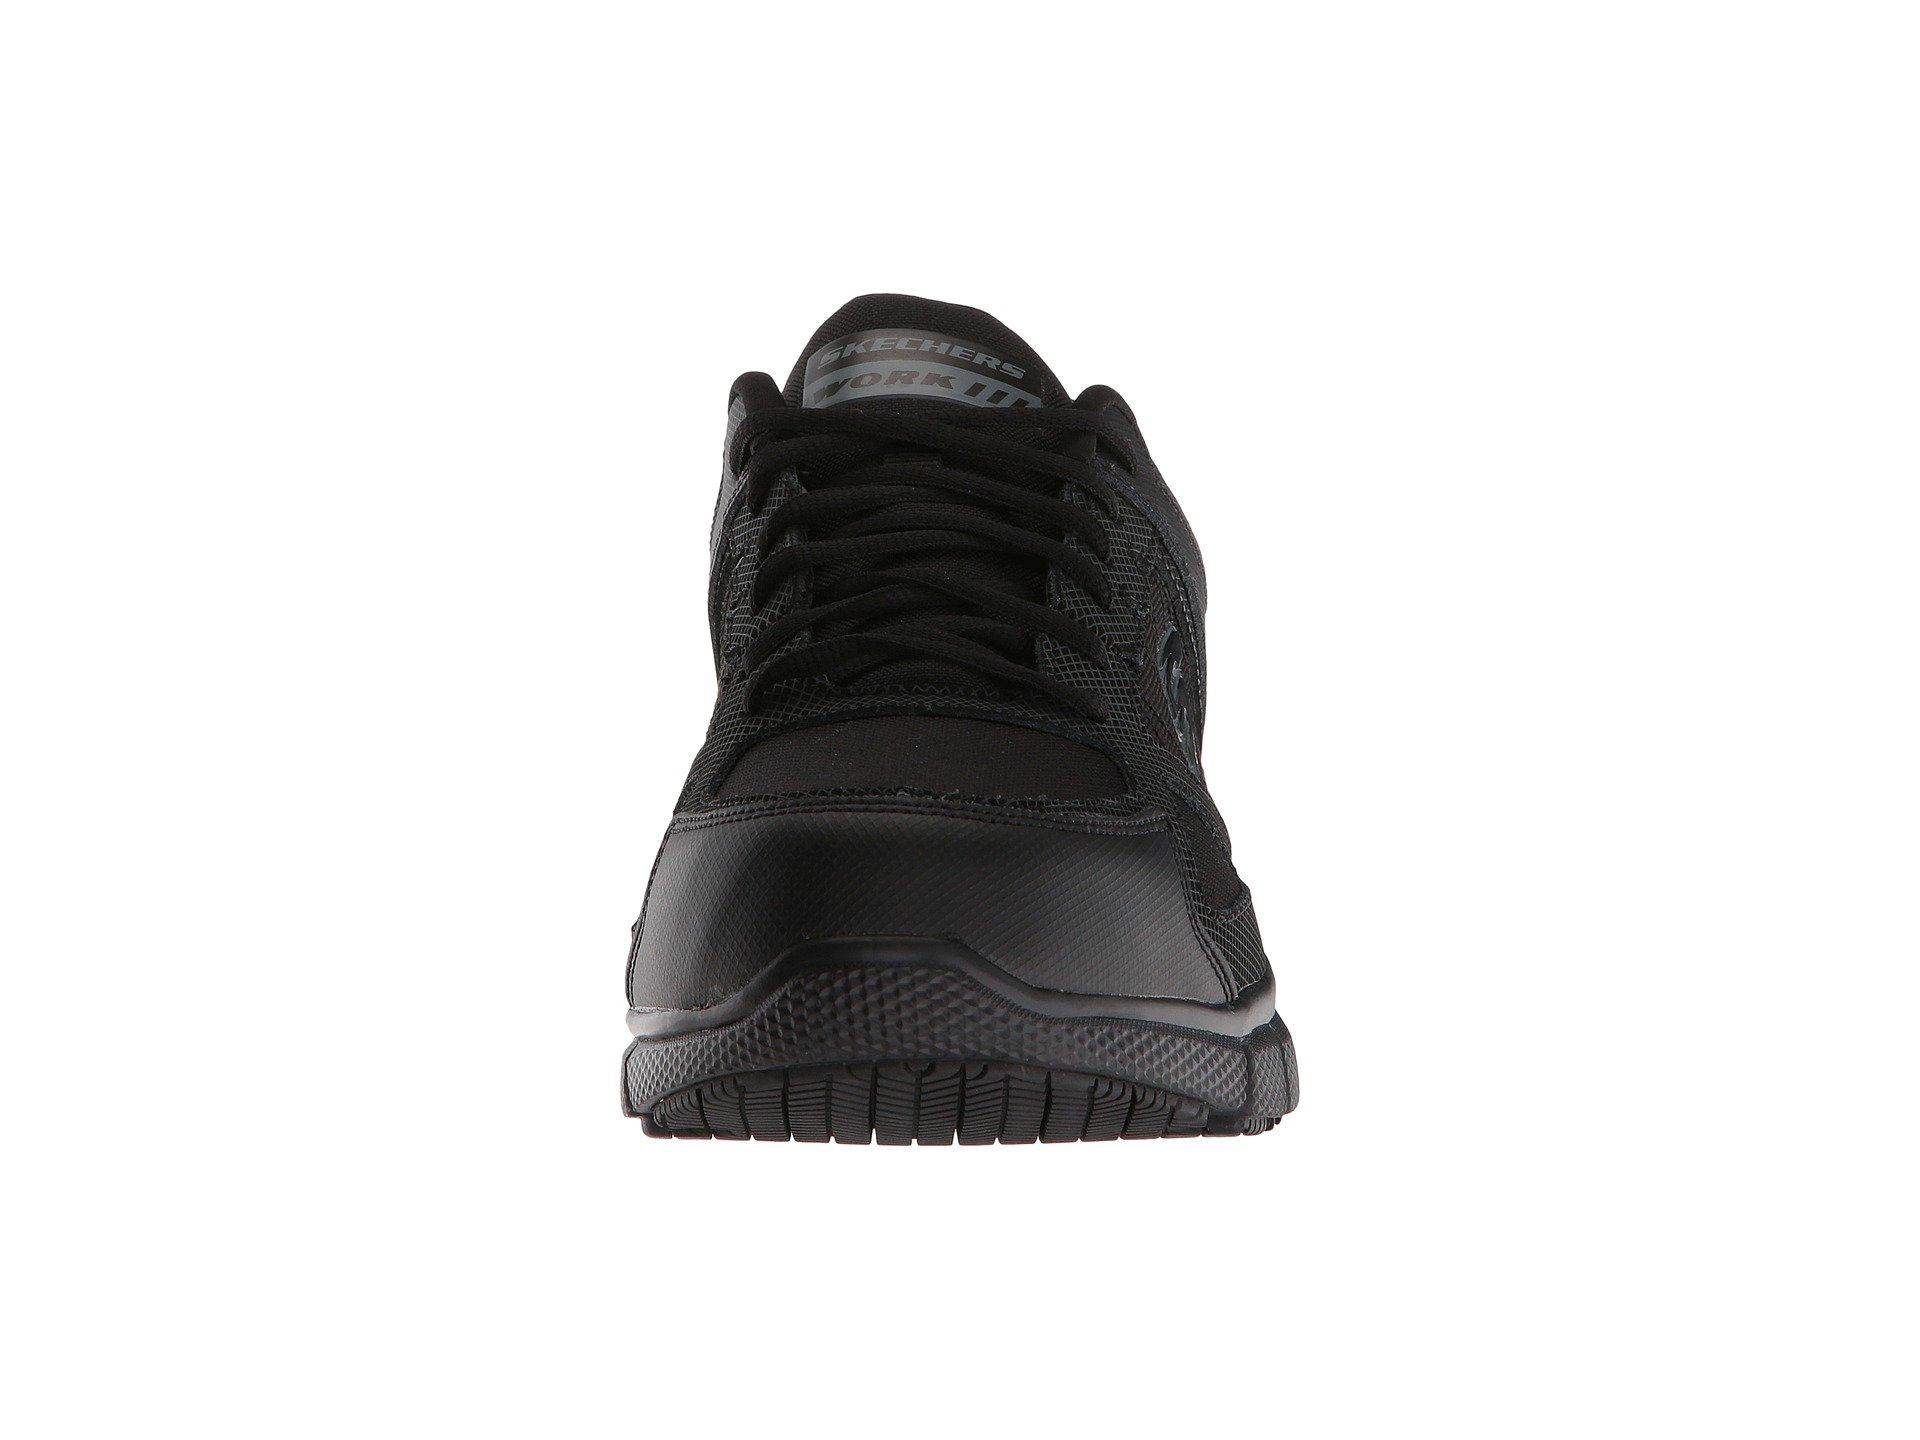 ce9d2f8809fb ... sale uk 60e0e bb3a7 Skechers Telfin Mens Black Leather Comp Toe Slip  Resistant Safety Work Shoes ...